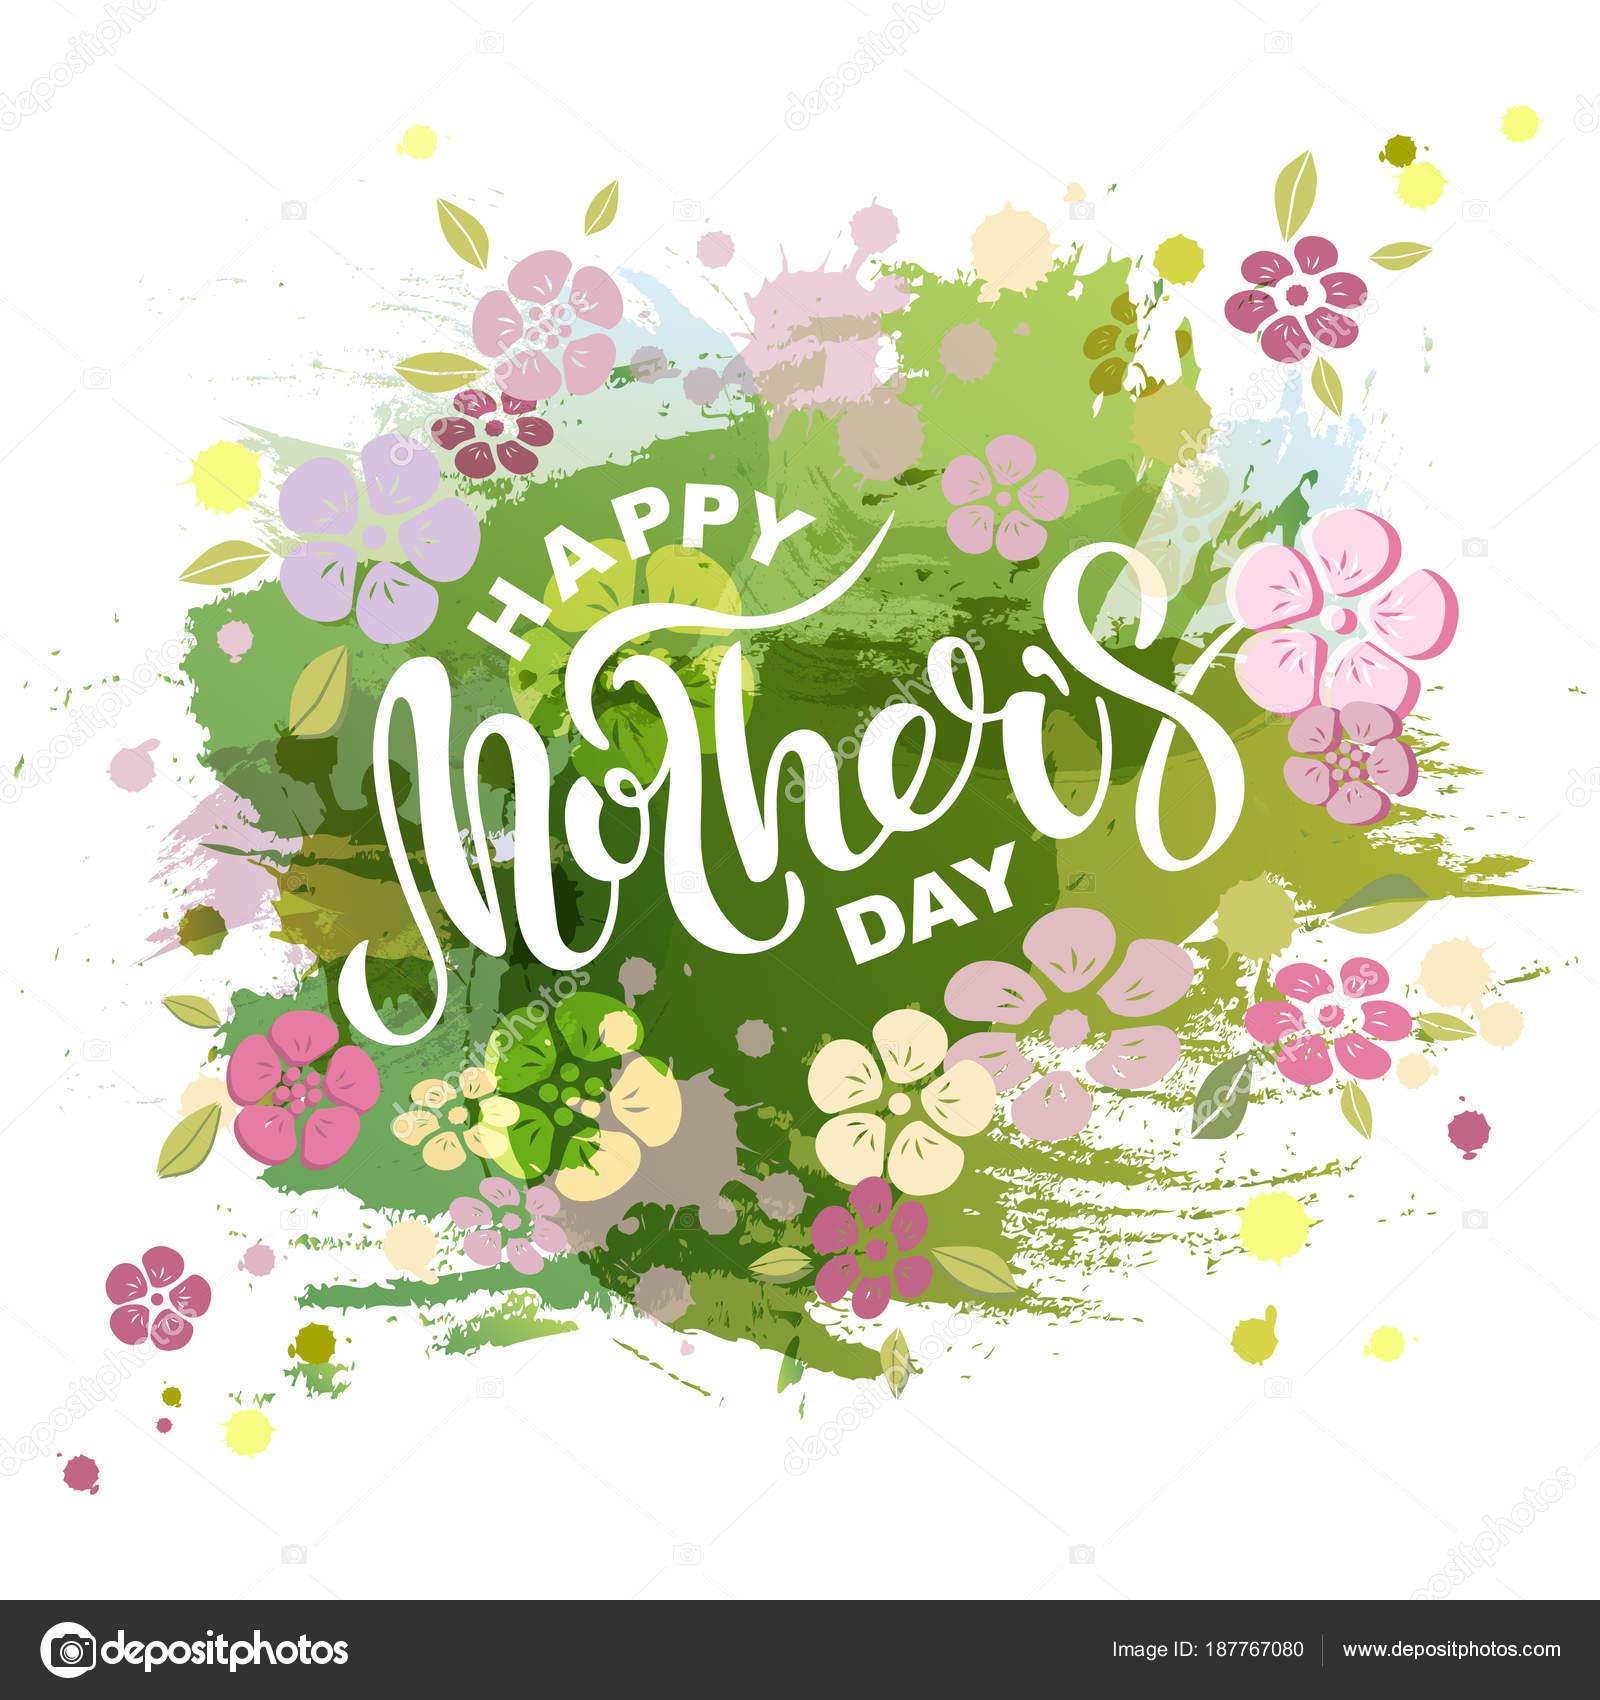 feliz día madre texto aislado sobre fondo imitación acuarela letras